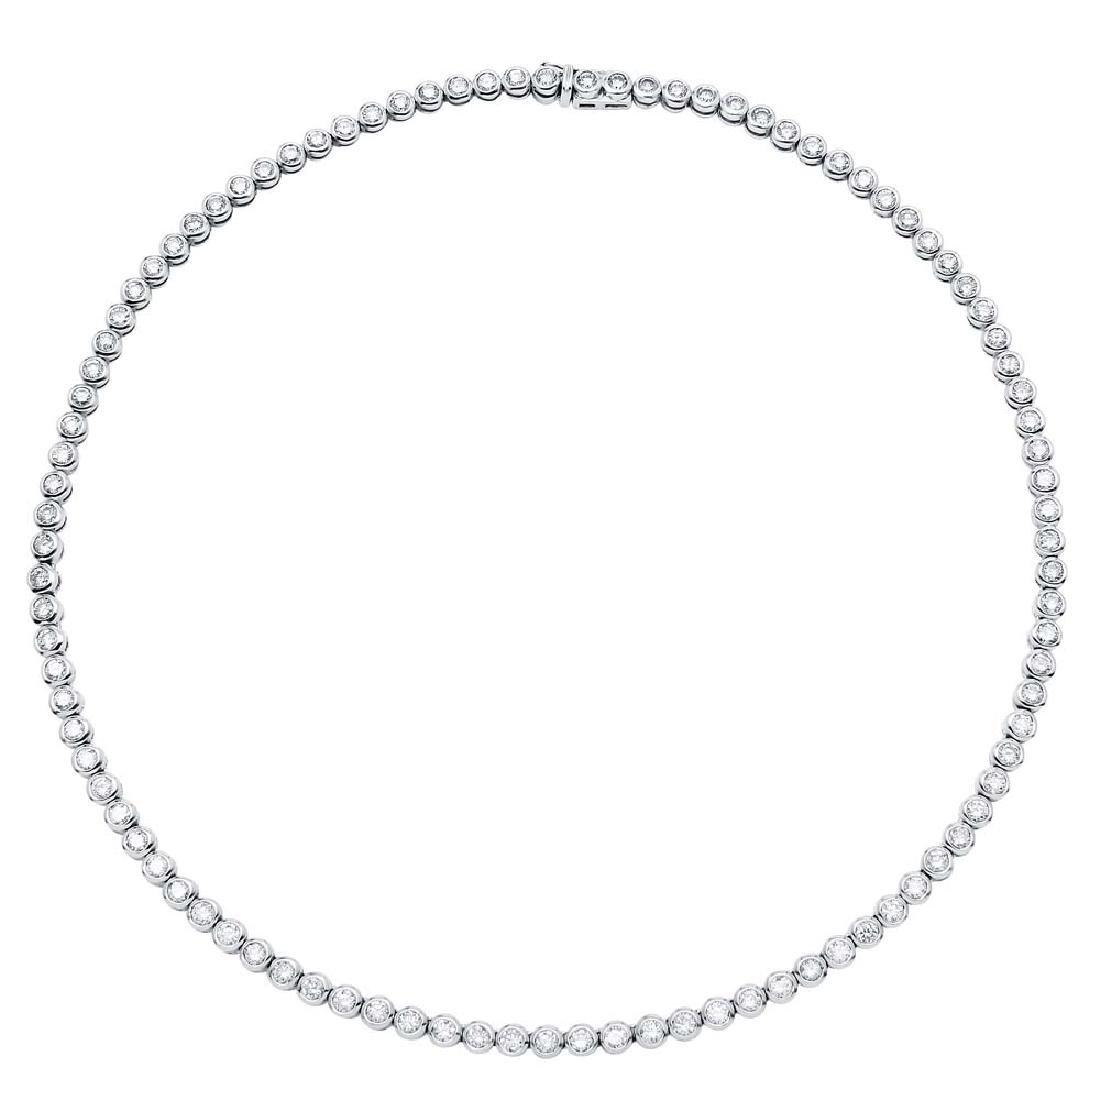 14K Gold 9.57 CTW Diamond Necklace